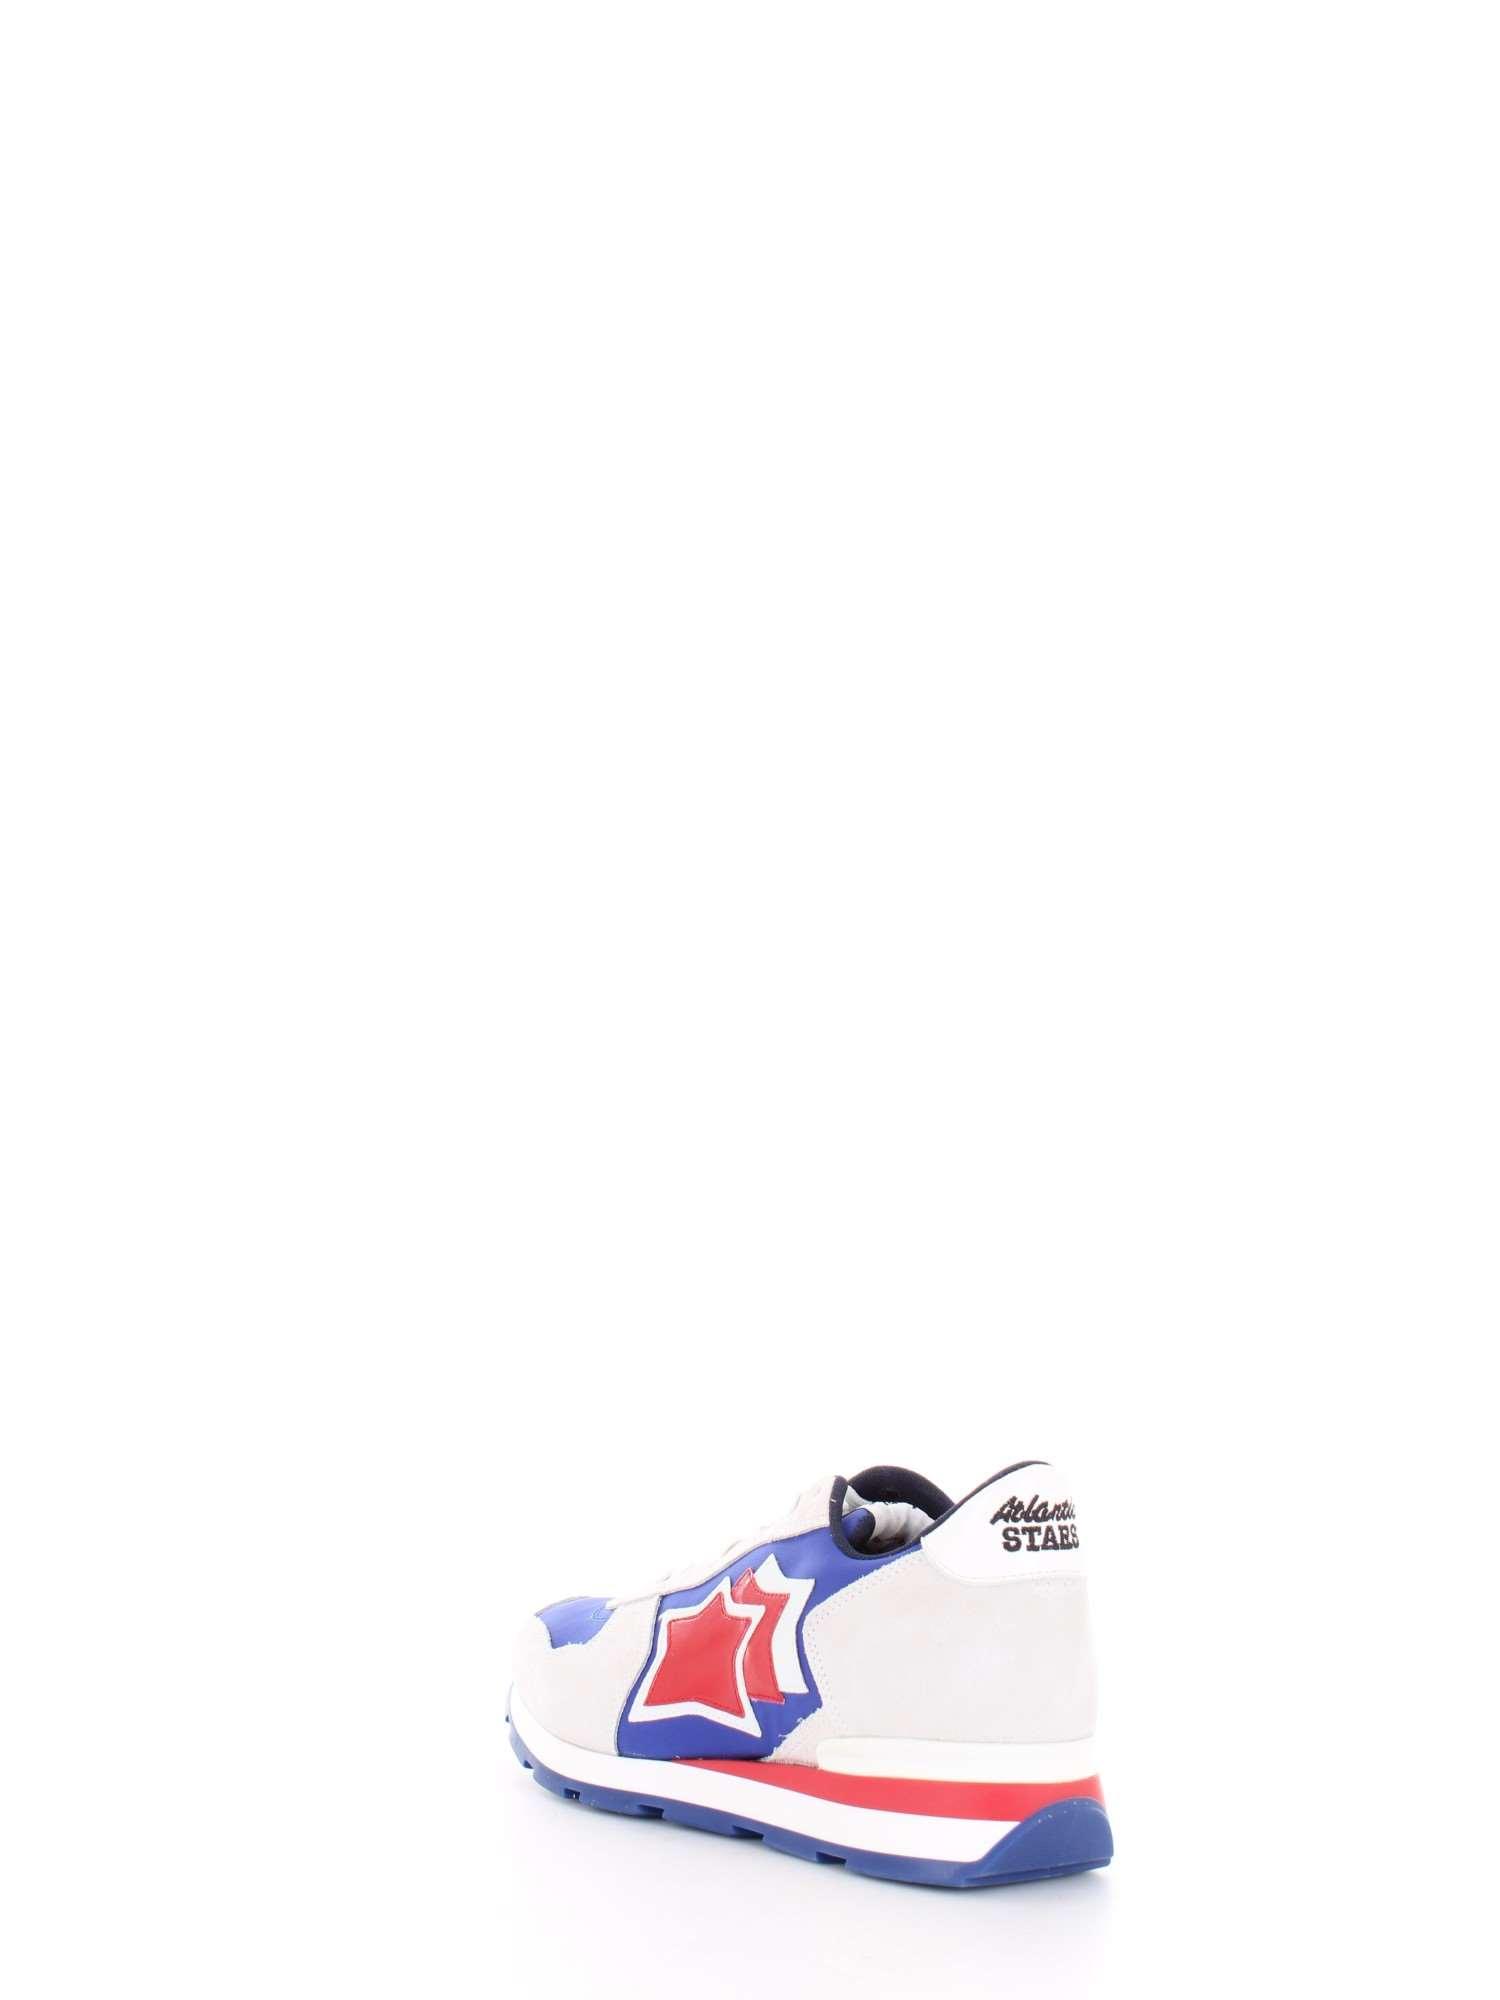 Bianco Uomo Atlantic Sneakers Primavera estate Royal neb14b Stars Antares qSwZxawEY